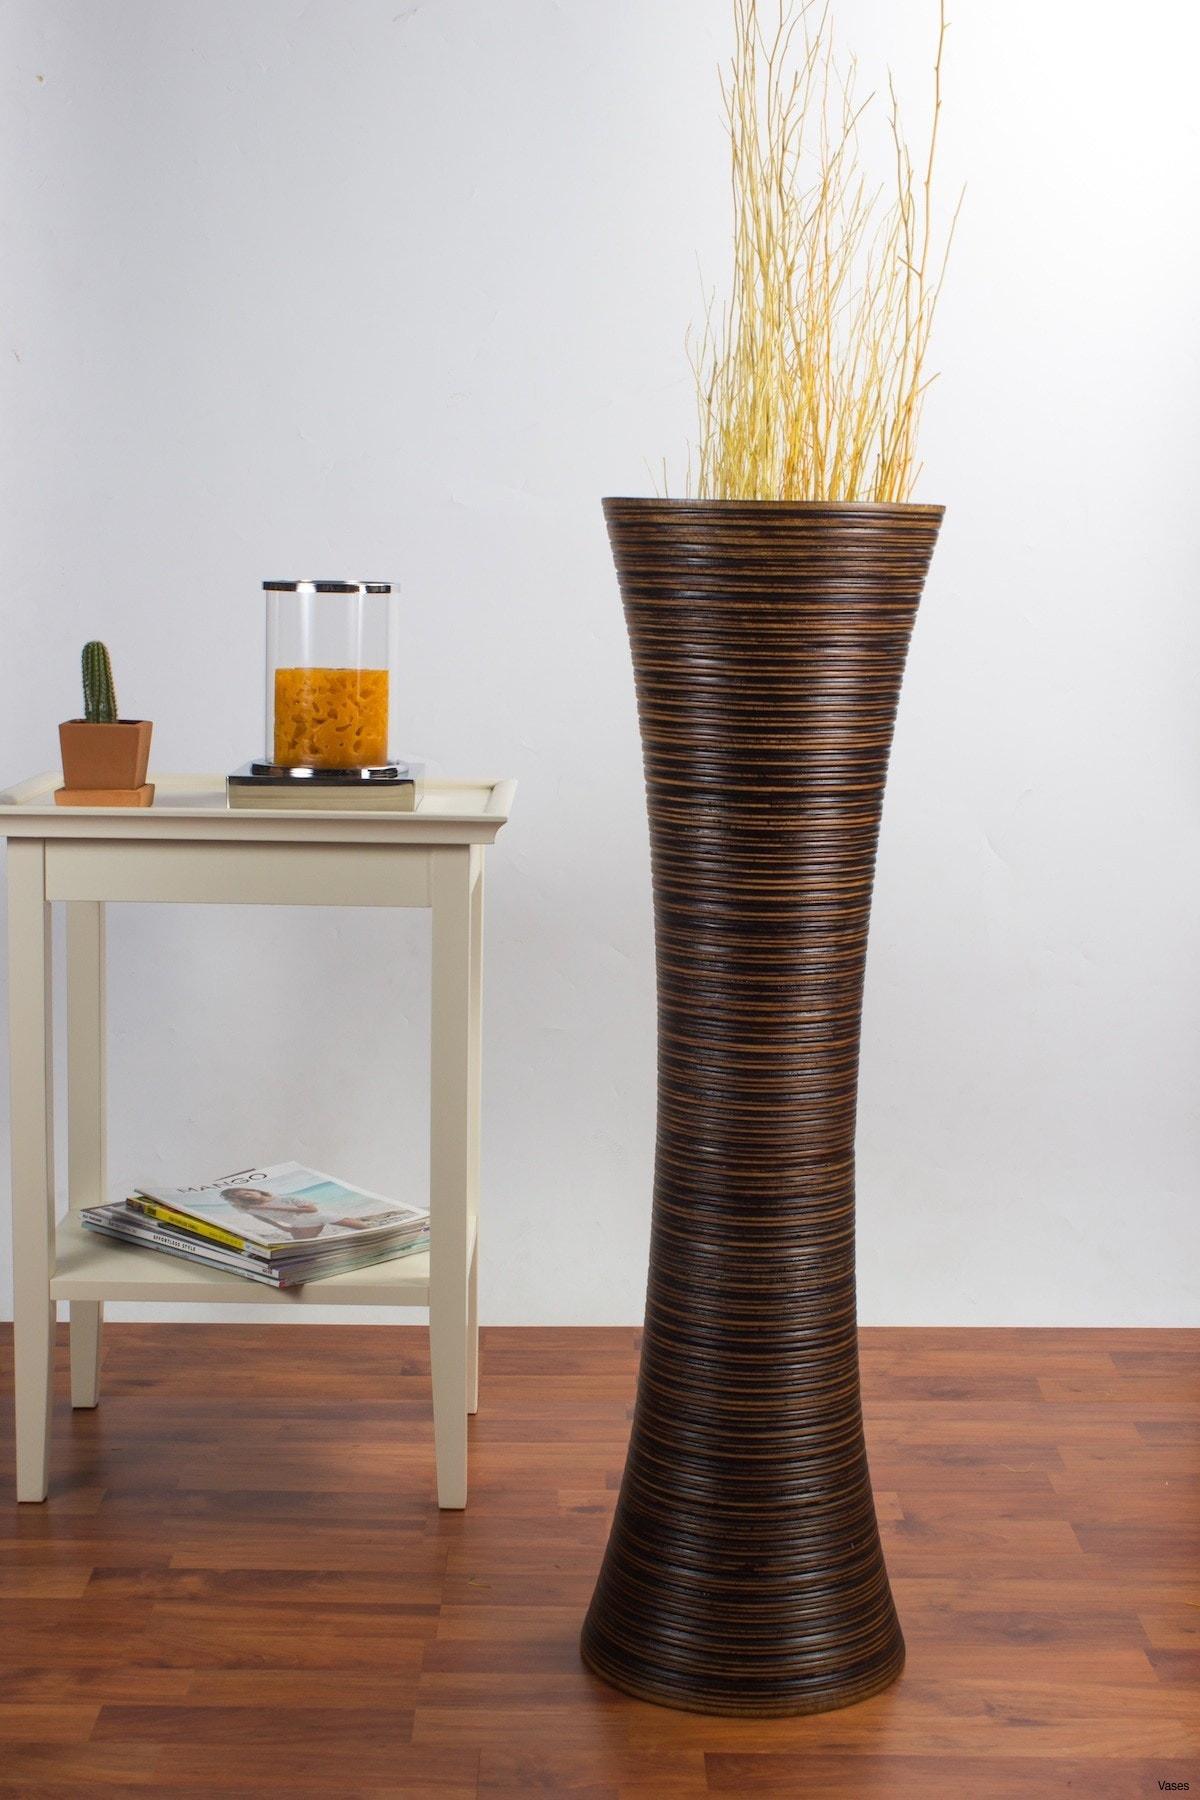 24 inch tall clear vases of 20 unique very tall decorative vases bogekompresorturkiye com regarding decorative floor vases fresh d dkbrw 5749 1h vases tall brown i 0d design ideas